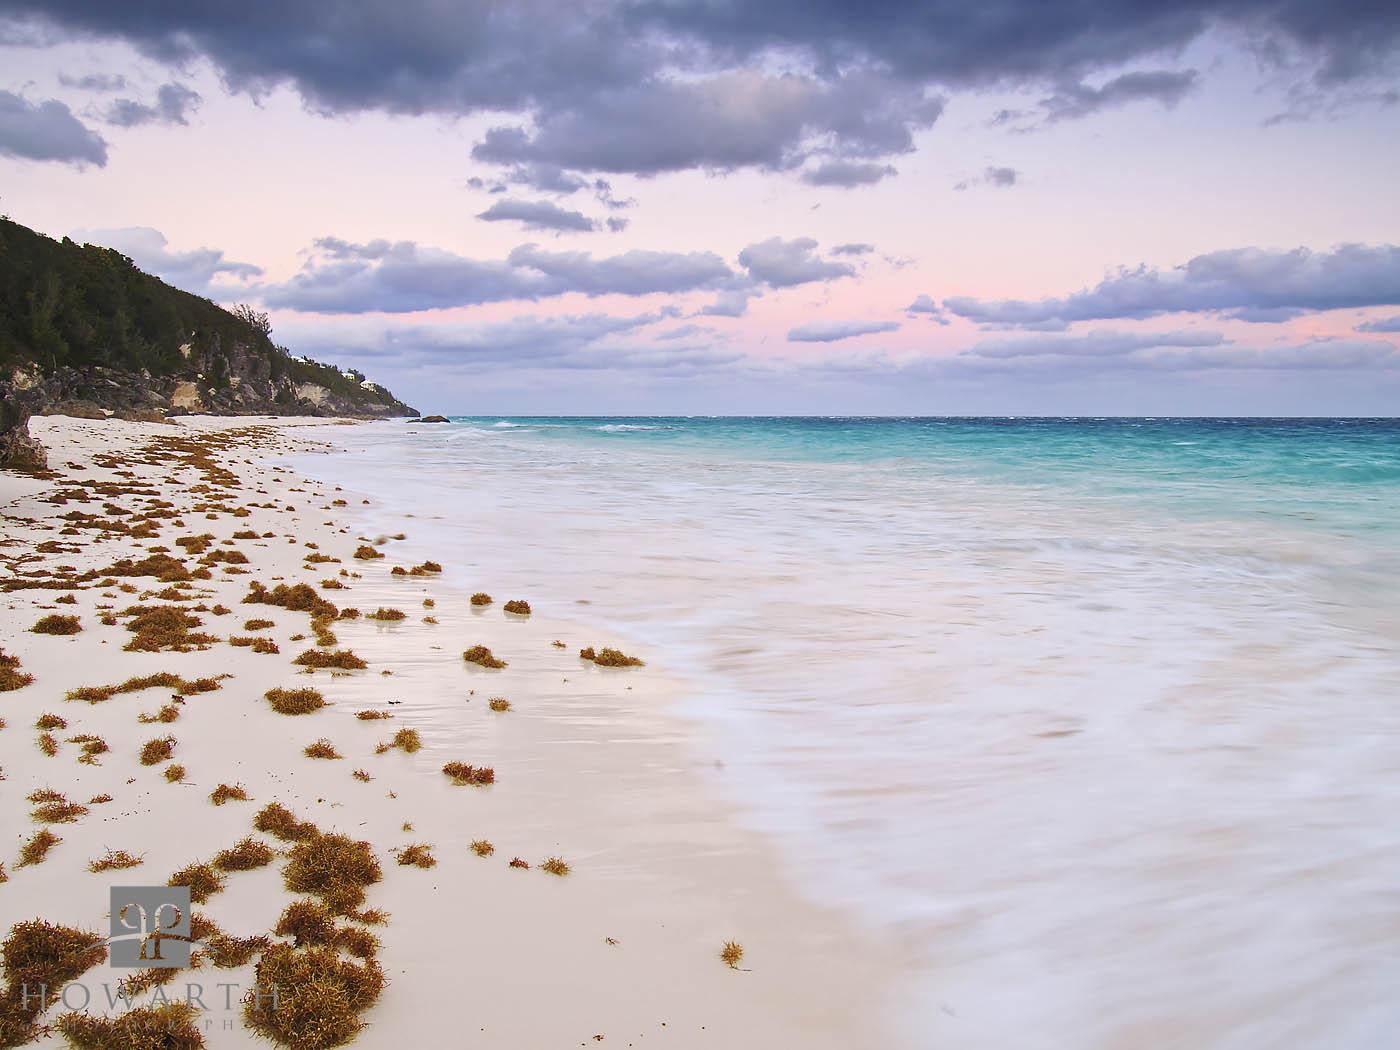 sea, weed, seaweed, beach, sunrise, morning, south, shore, photo